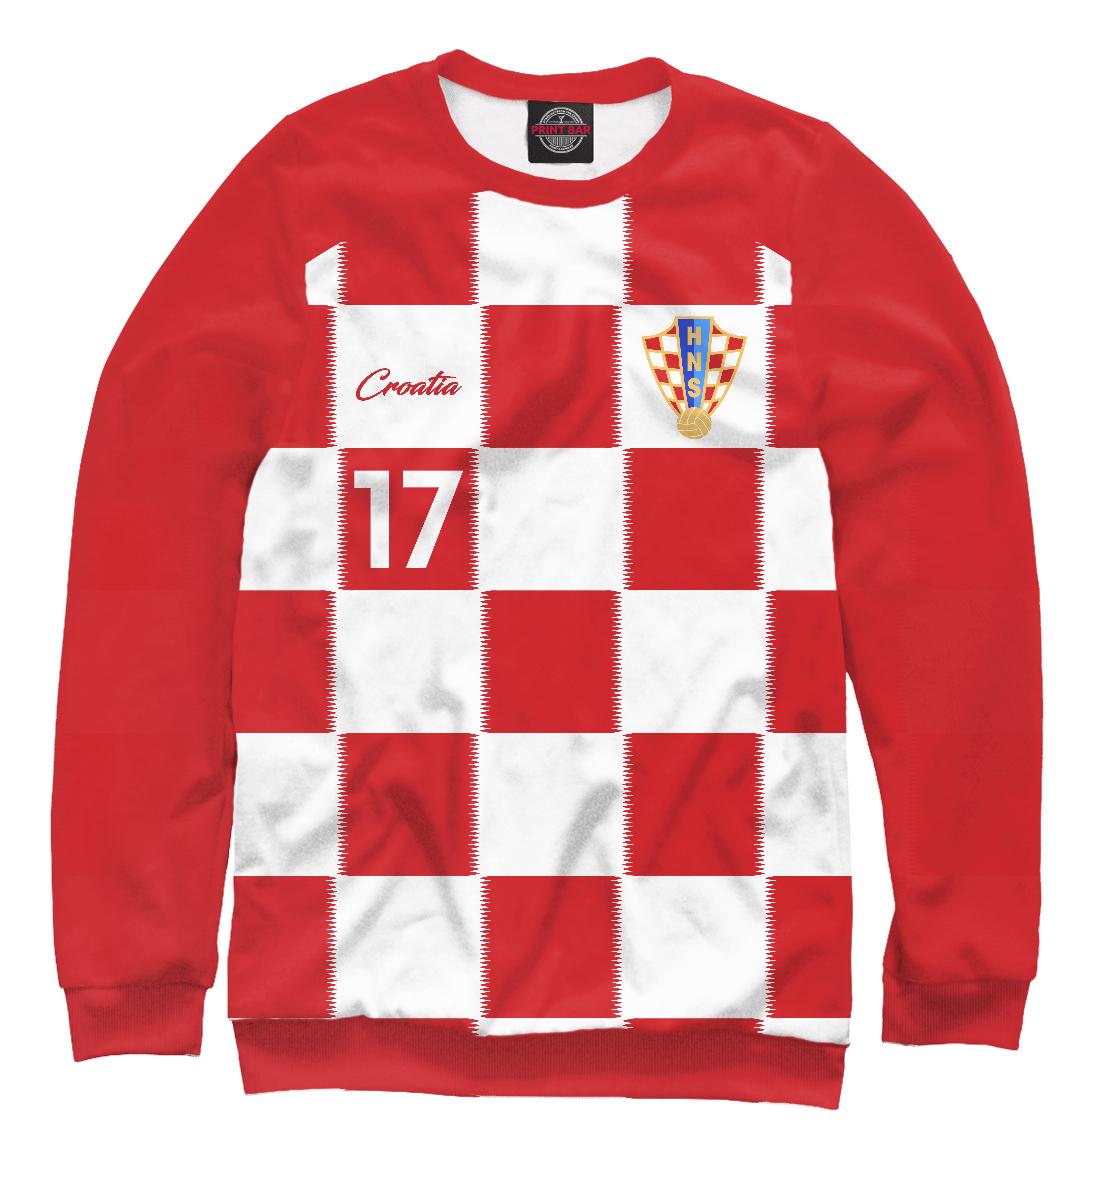 Купить Марио Манджукич - Сборная Хорватии, Printbar, Свитшоты, FLT-790781-swi-2